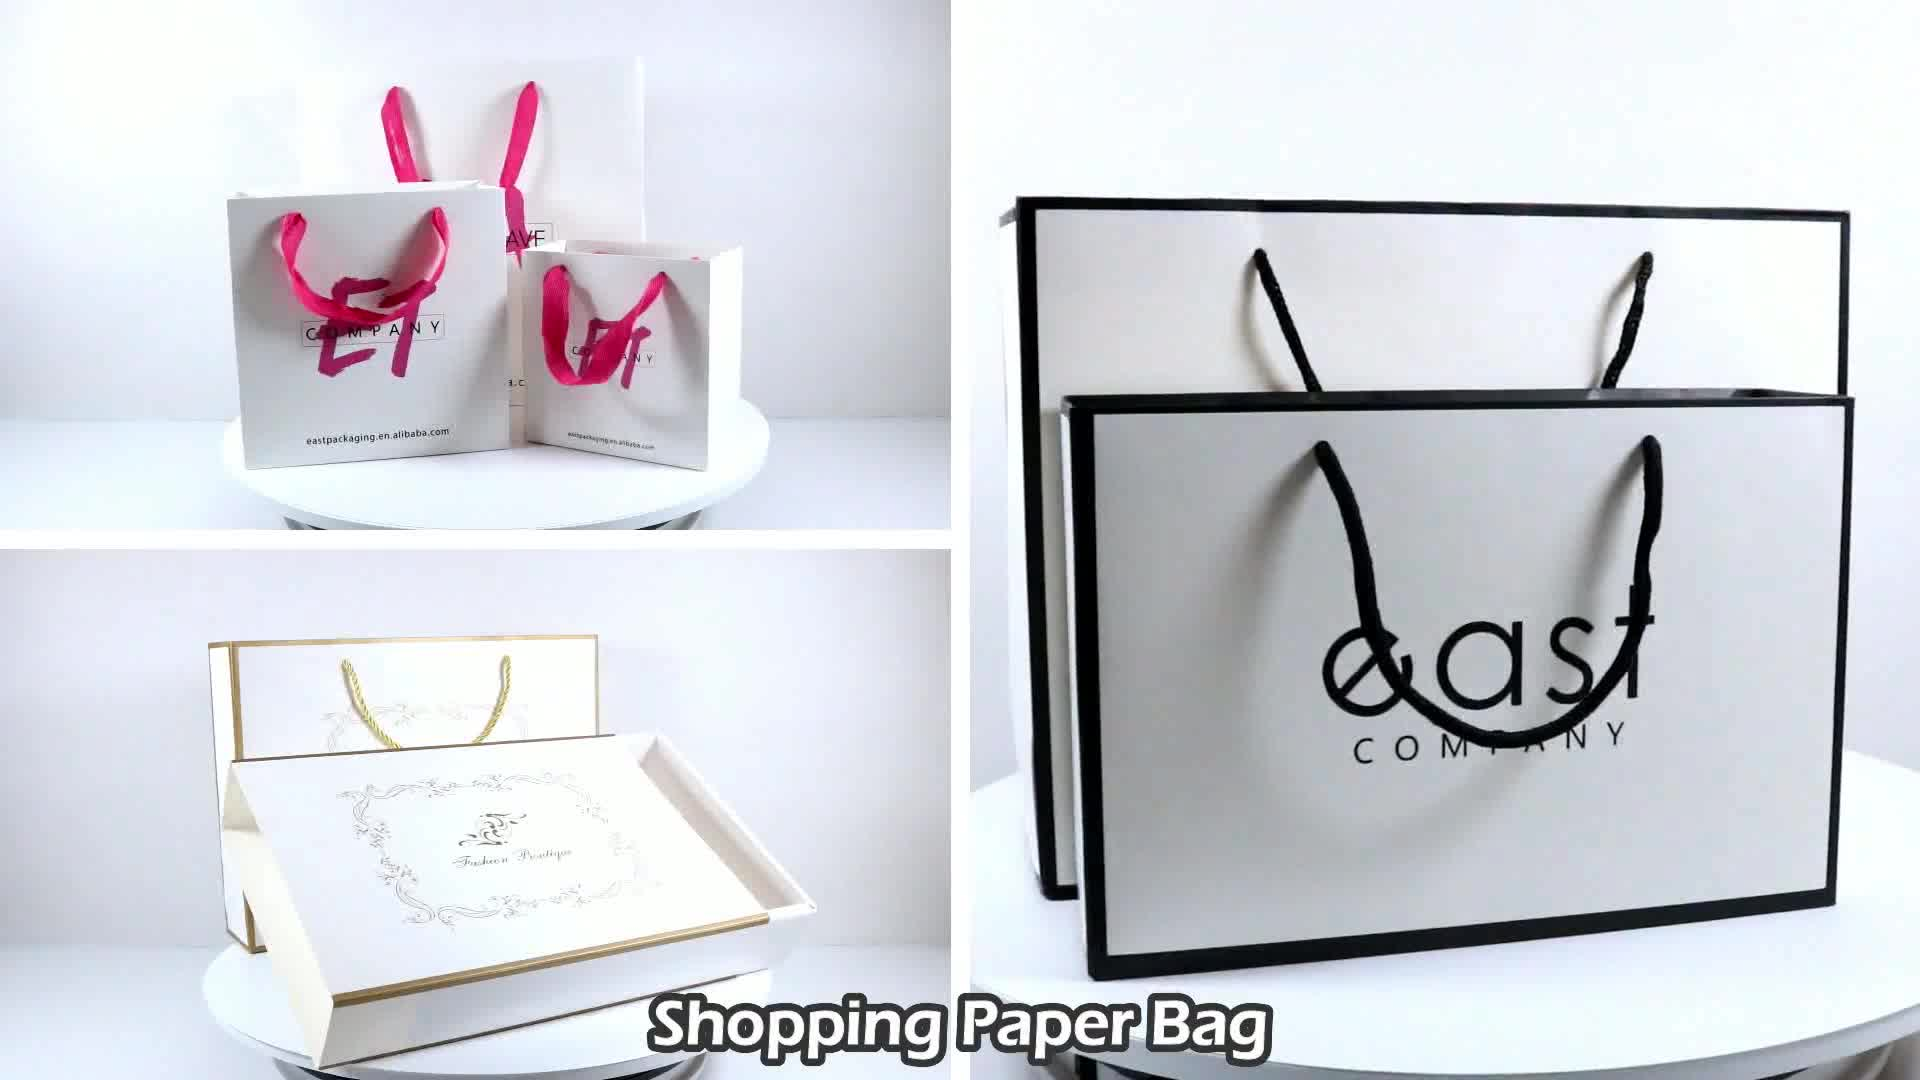 OEM ที่กำหนดเองหรูหรากระเป๋าสีดำร้อน Foiled Art กระดาษเคลือบกระเป๋า PP เชือก